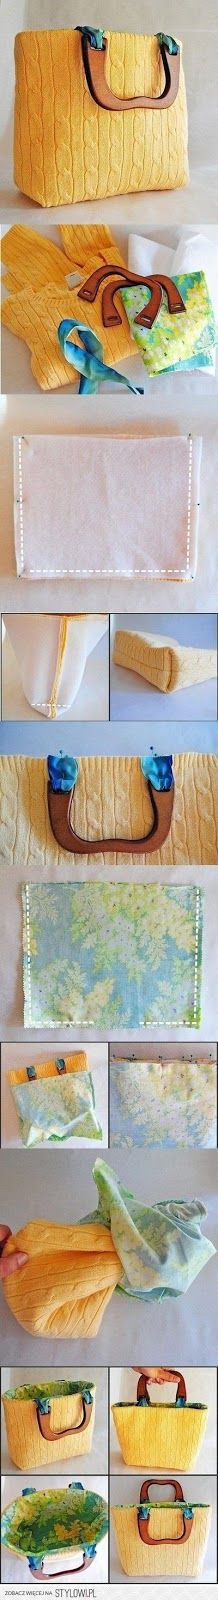 #DIY #FAIDATE #RICICLO Turning a swater in a bag | trasformare un maglione in…